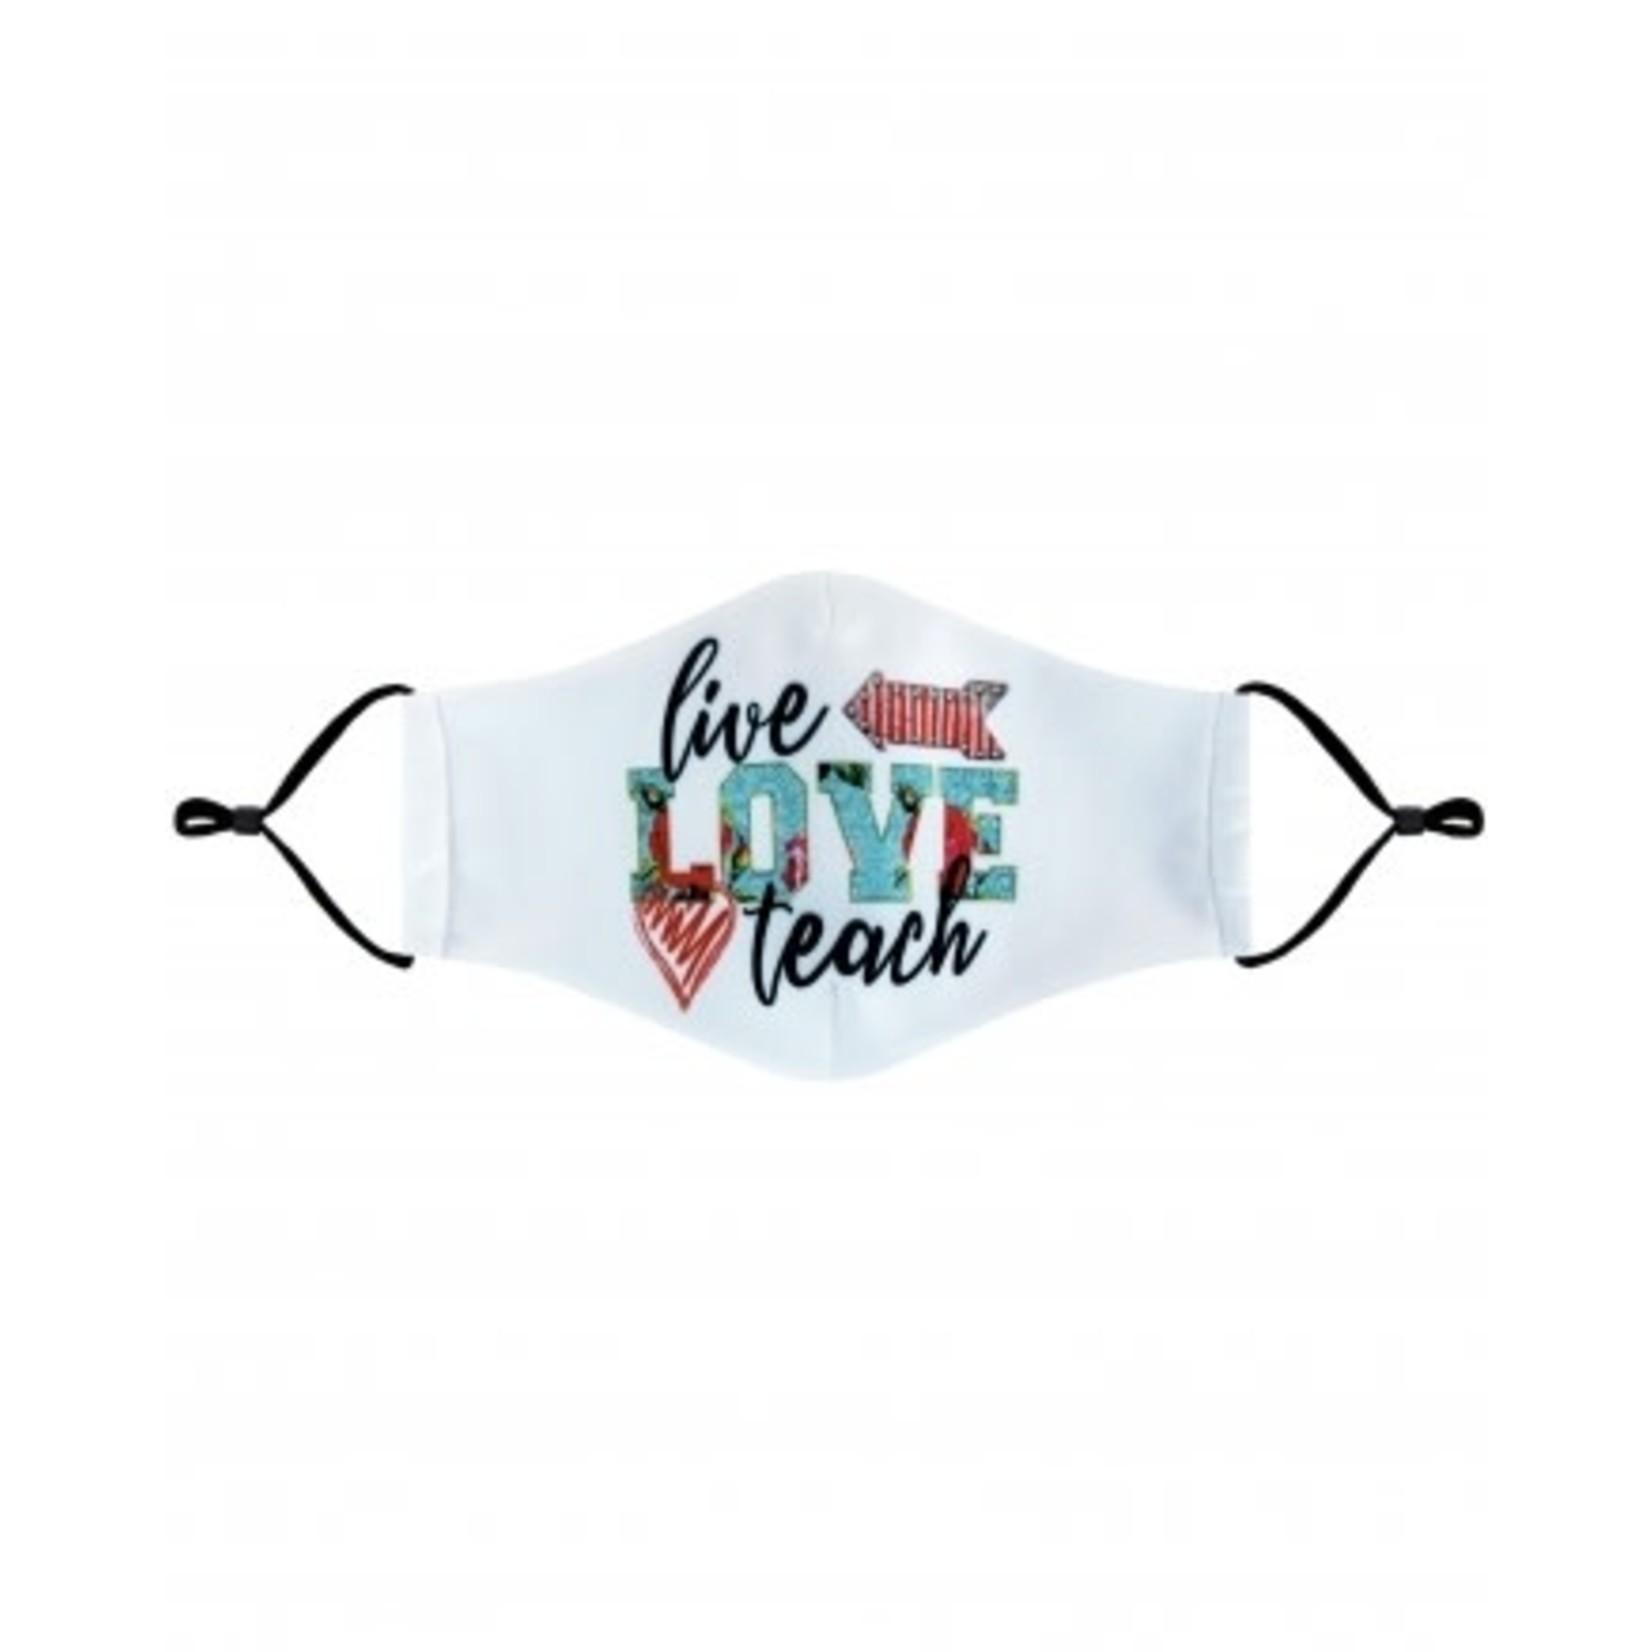 Live Love Teach cloth mask